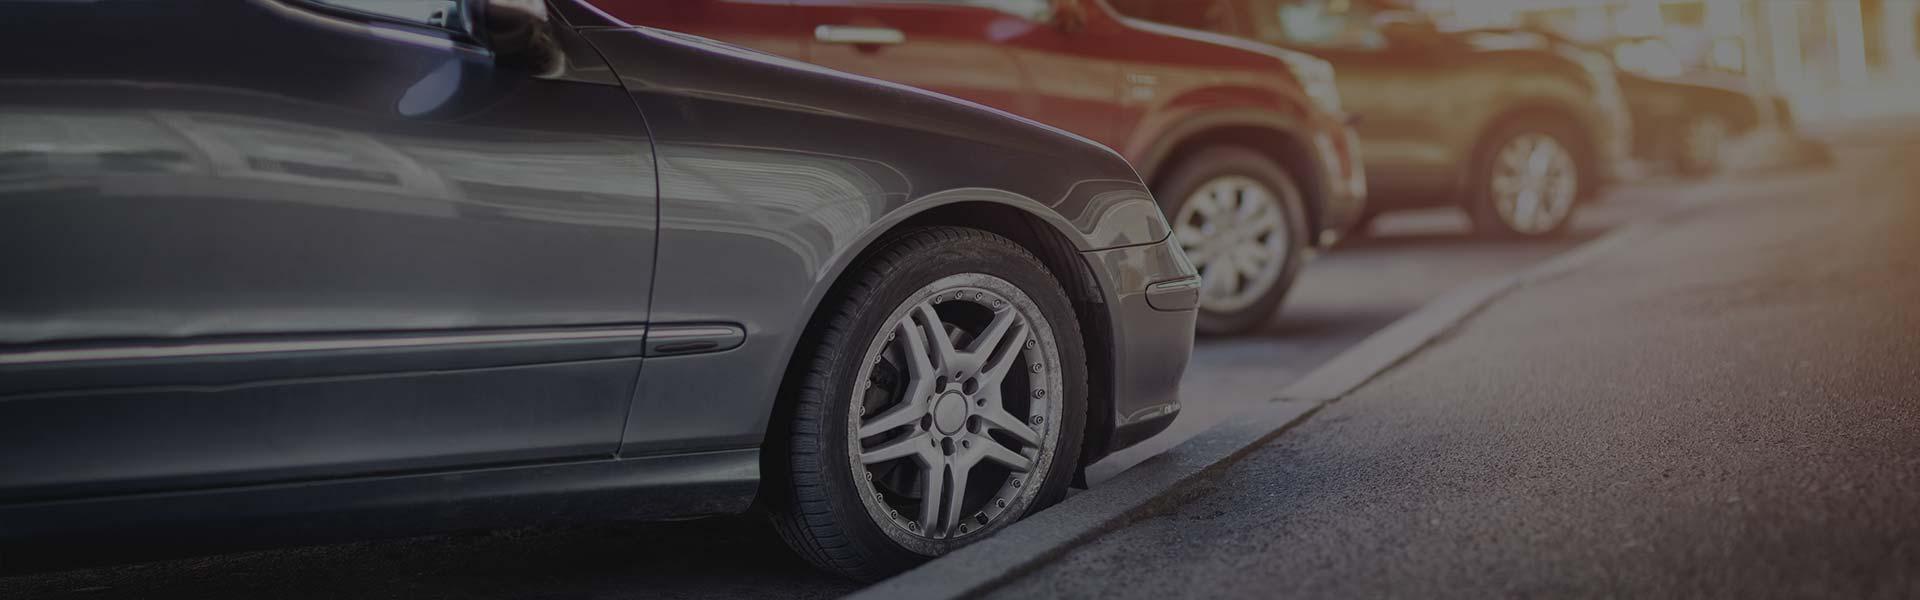 vente voiture neuf occasion futur automobile